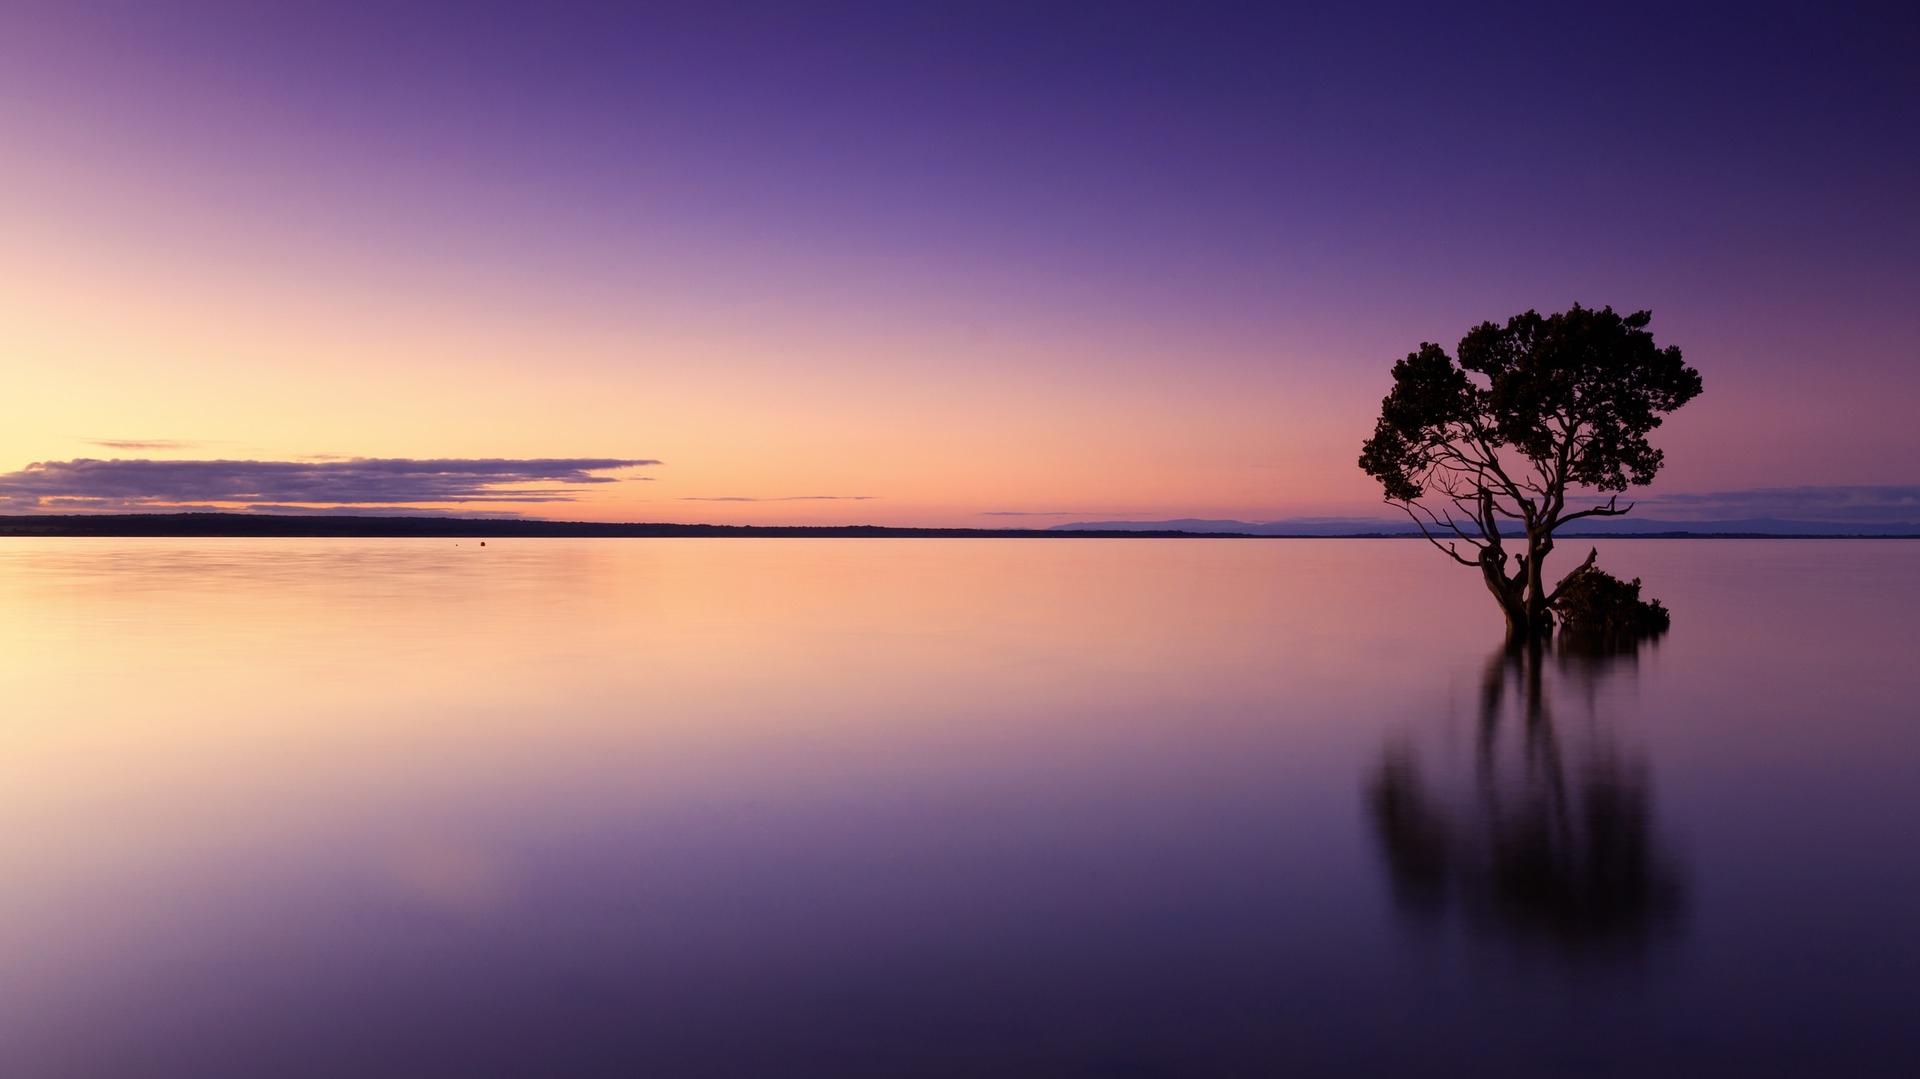 purple sunset seascape domestic violence mental health of female victims